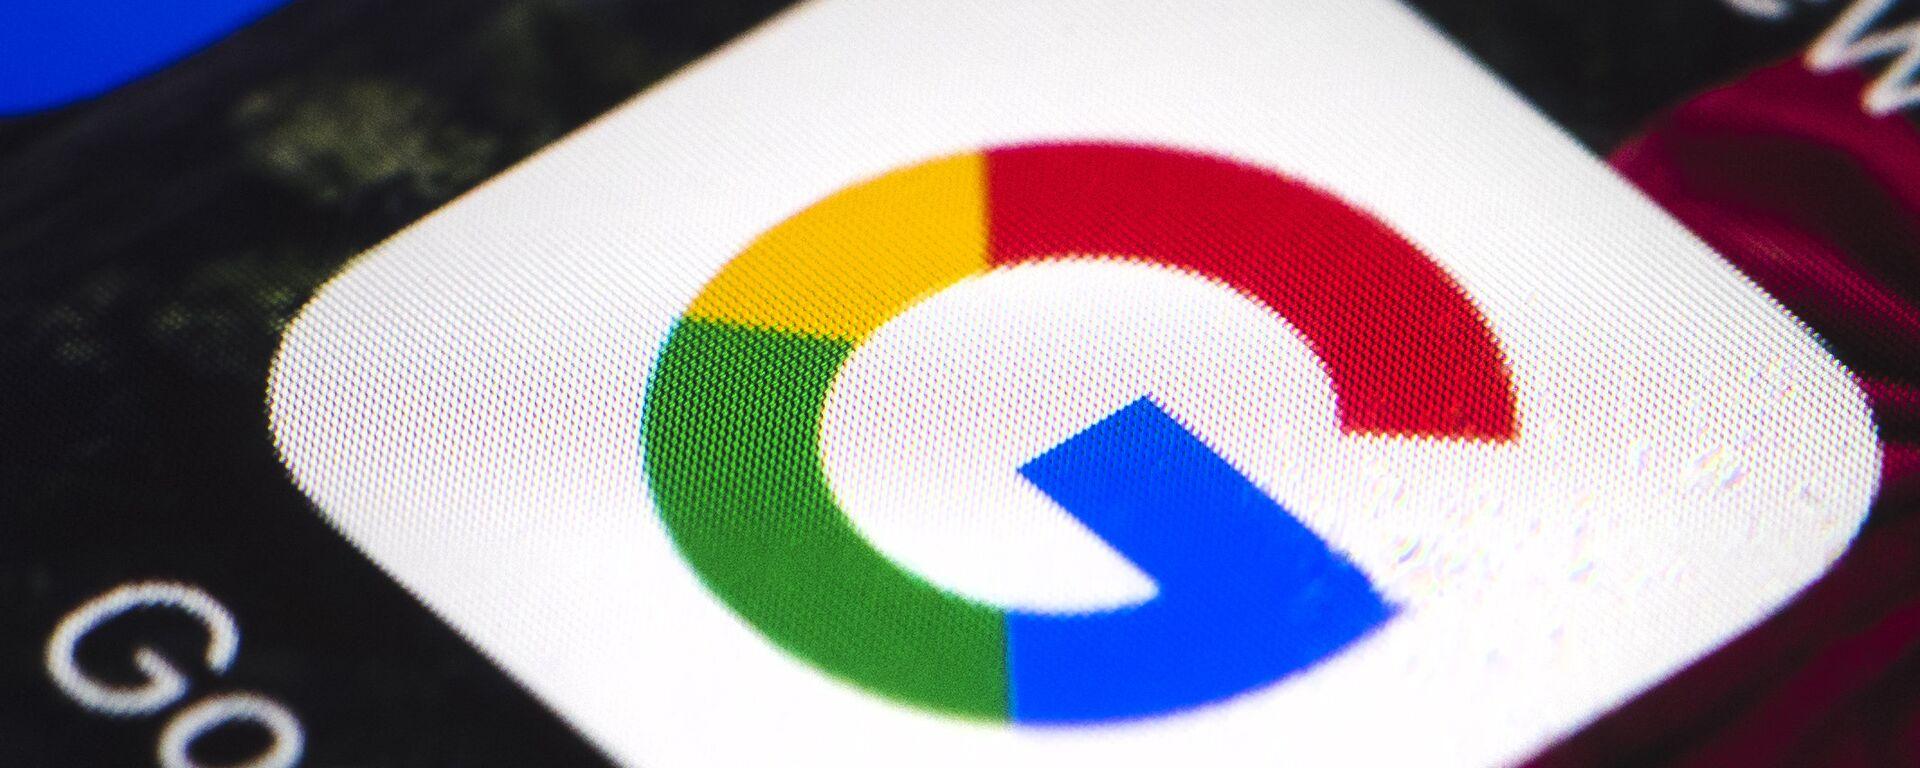 Logo de Google (archivo) - Sputnik Mundo, 1920, 01.04.2021